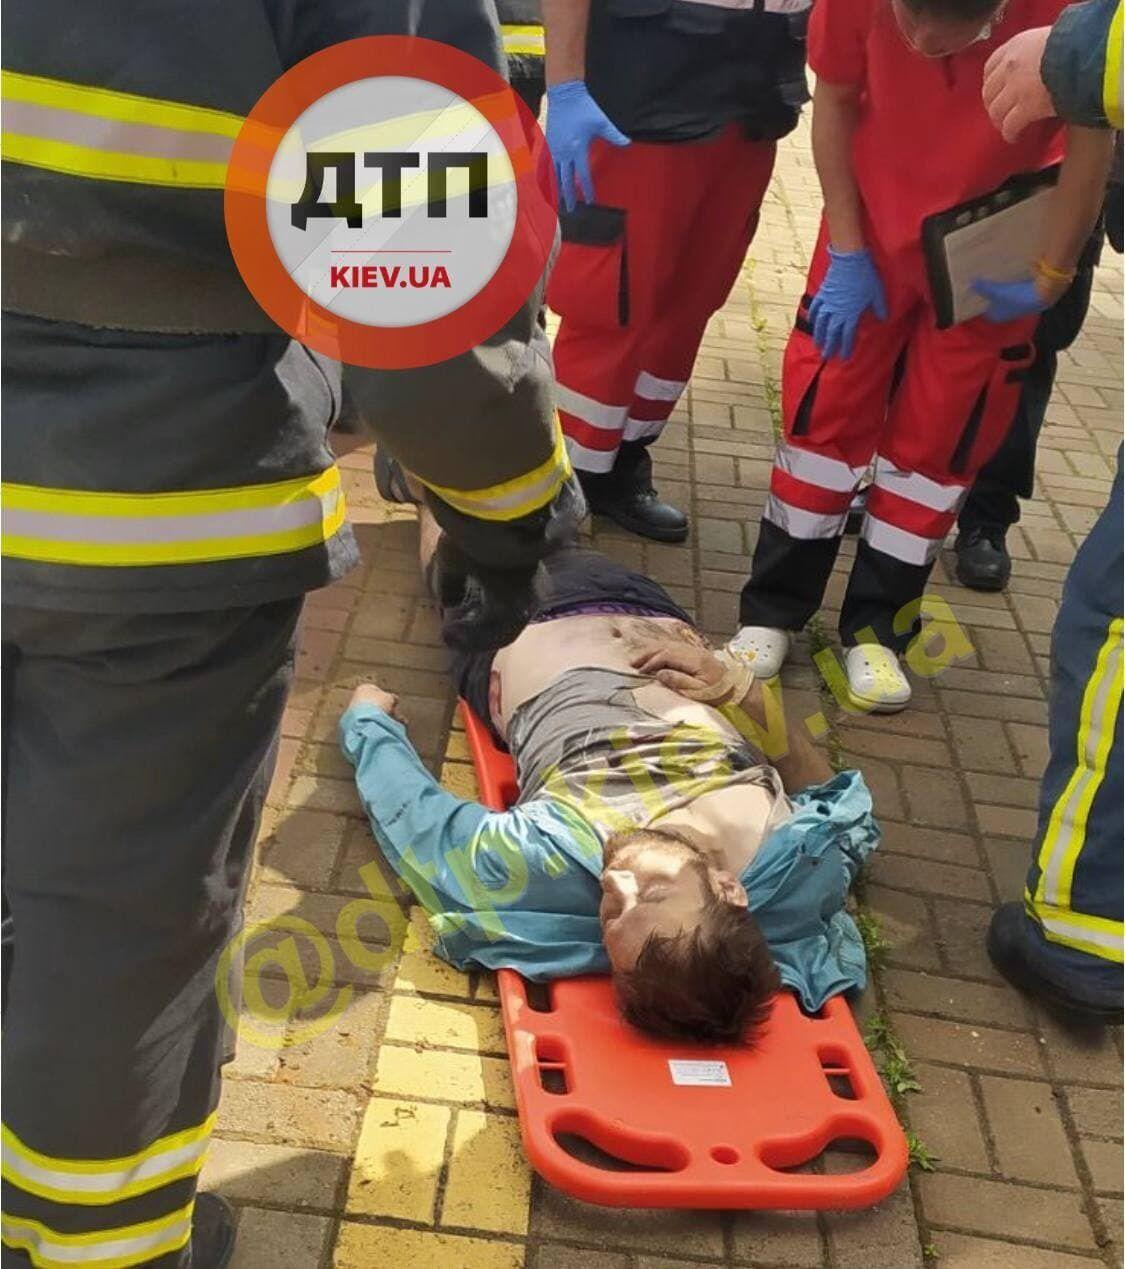 От полученных травм мужчина погиб на месте.